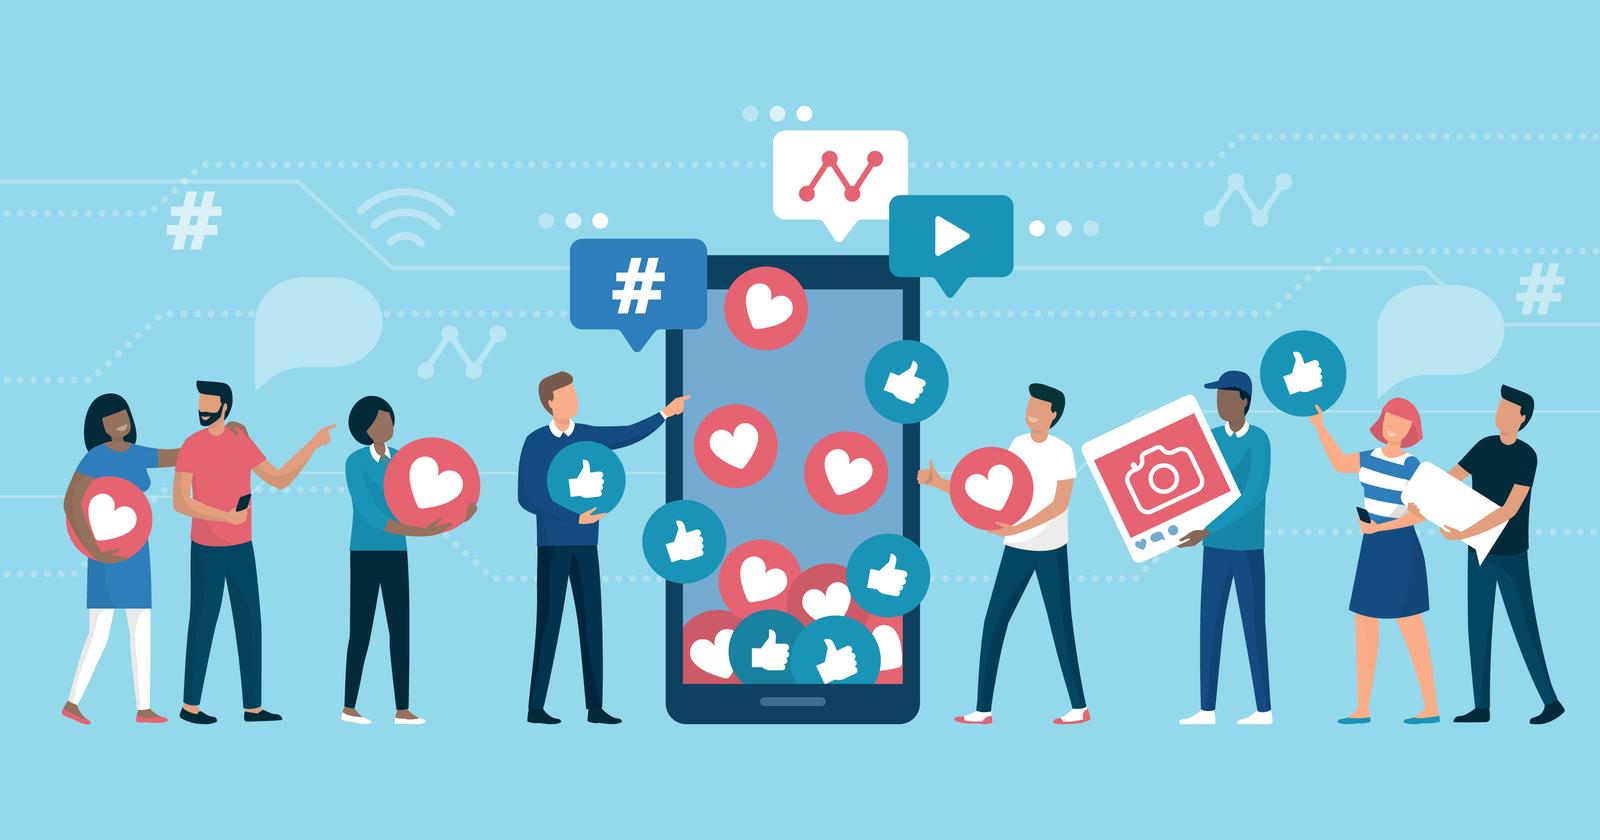 B2B social media channels